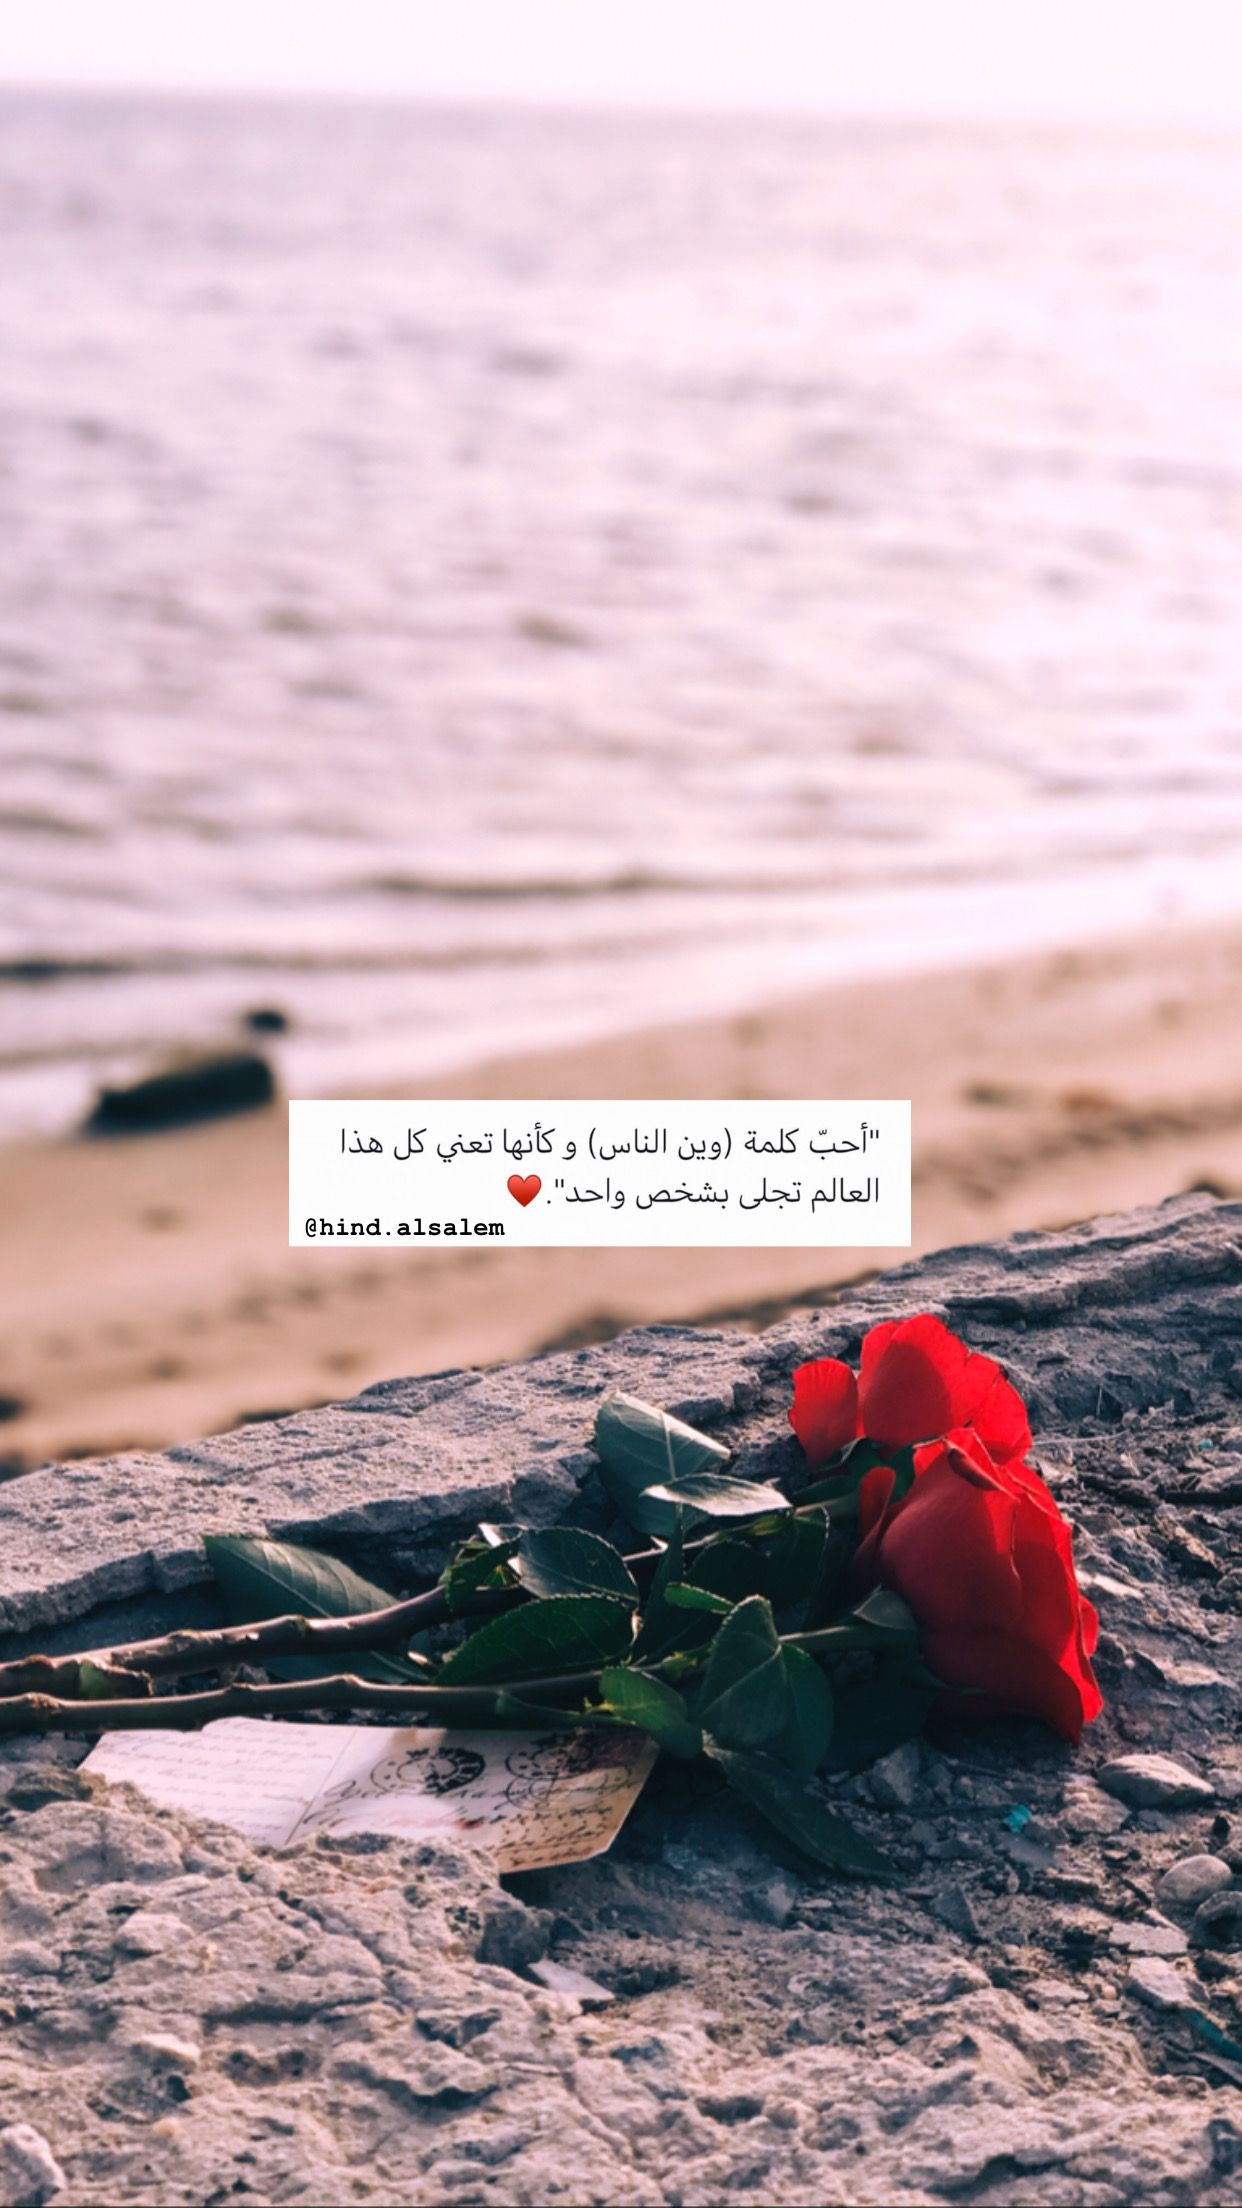 Photo Coffee Coffe Love Photography Lover Instagram Snap تصويري تصوير احترافي سناب صوره ابداع حب عش Arabic Love Quotes Love Quotes Arabic Quotes